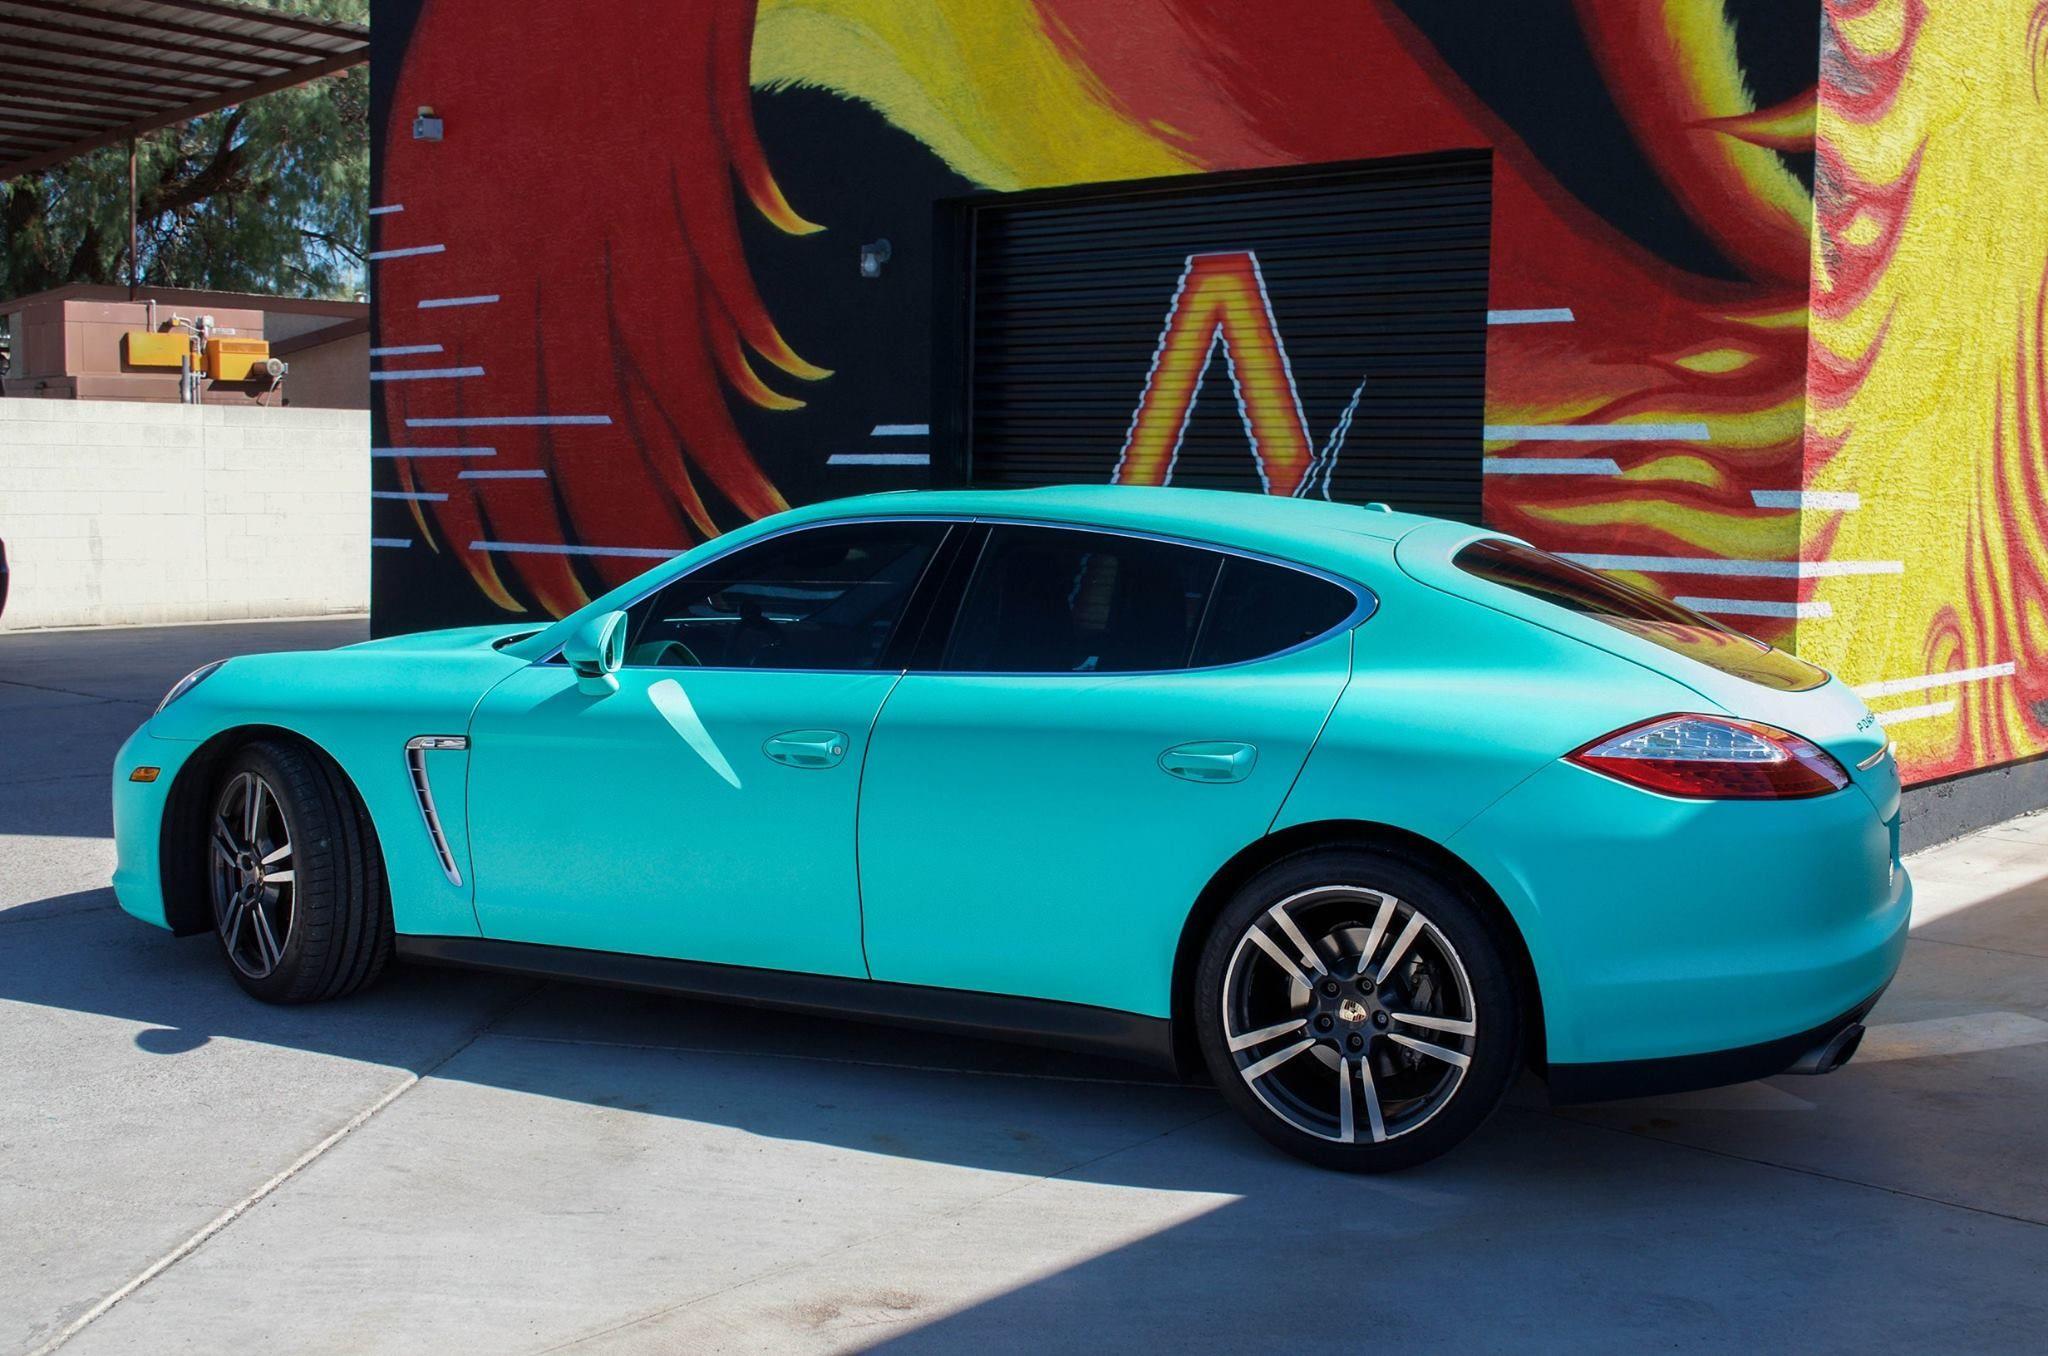 Porsche Panamera 4s Matte Emerald Green From Avery Dennison Tiffany Blue Automotive Shops Vinyl Racing Stripes Vinyl Wrap Car